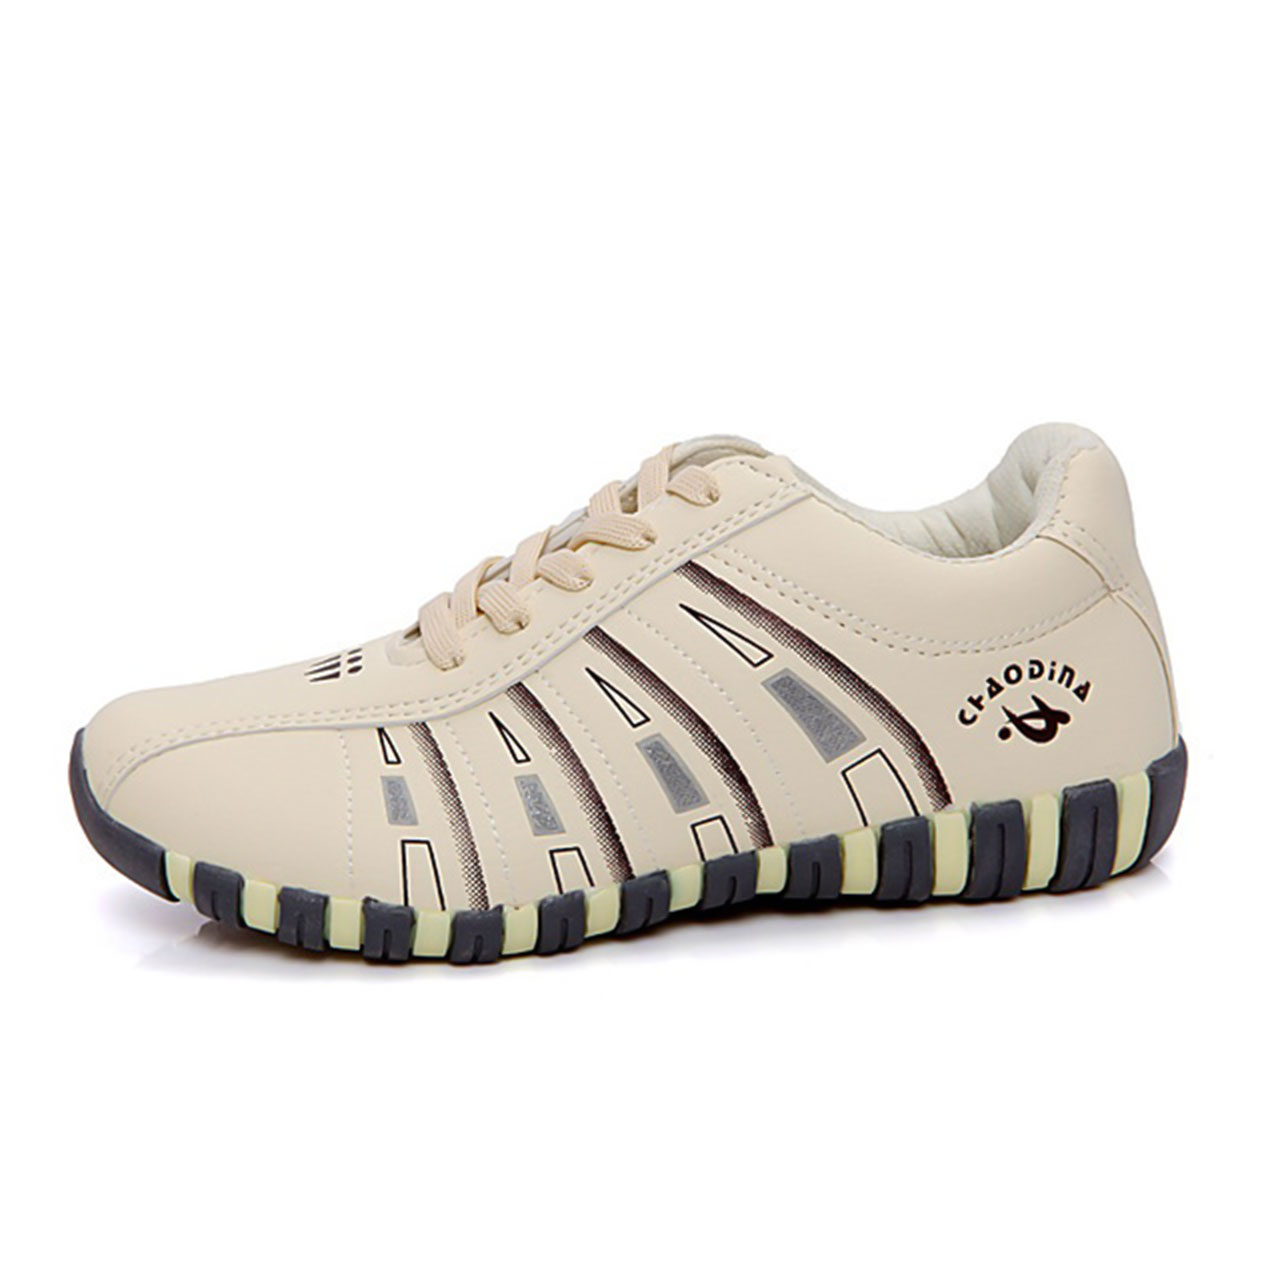 Women's Sneakers Flat Heel Lace-up PU Comfort Walking Shoes Beige